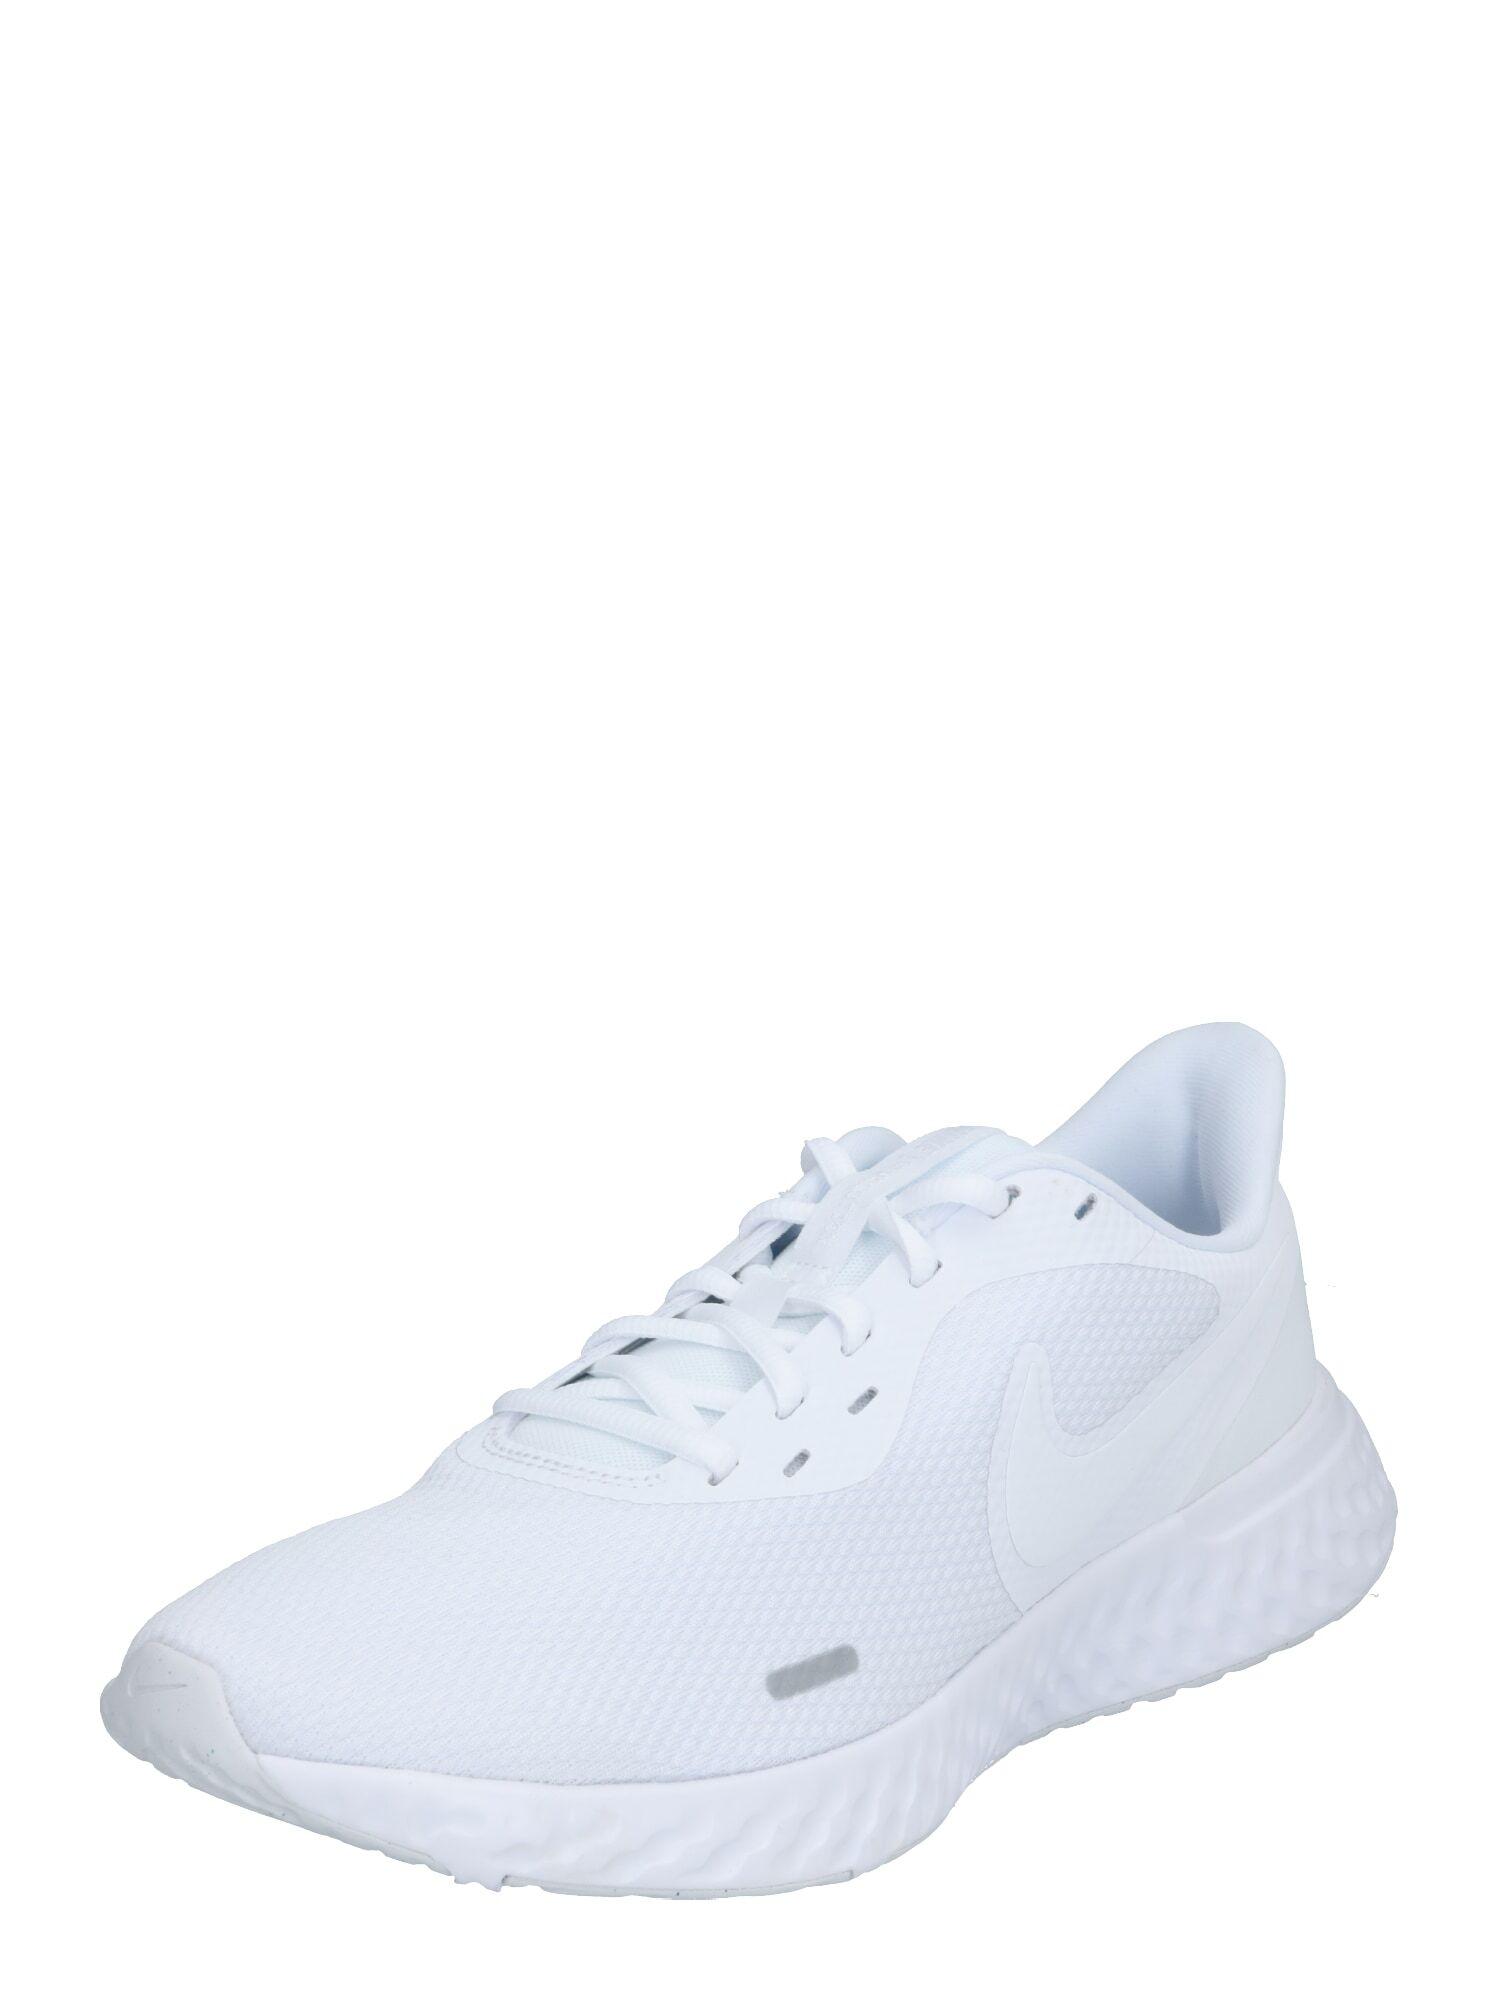 NIKE Chaussure de course 'Revolution 5'  - Blanc - Taille: 10 - male